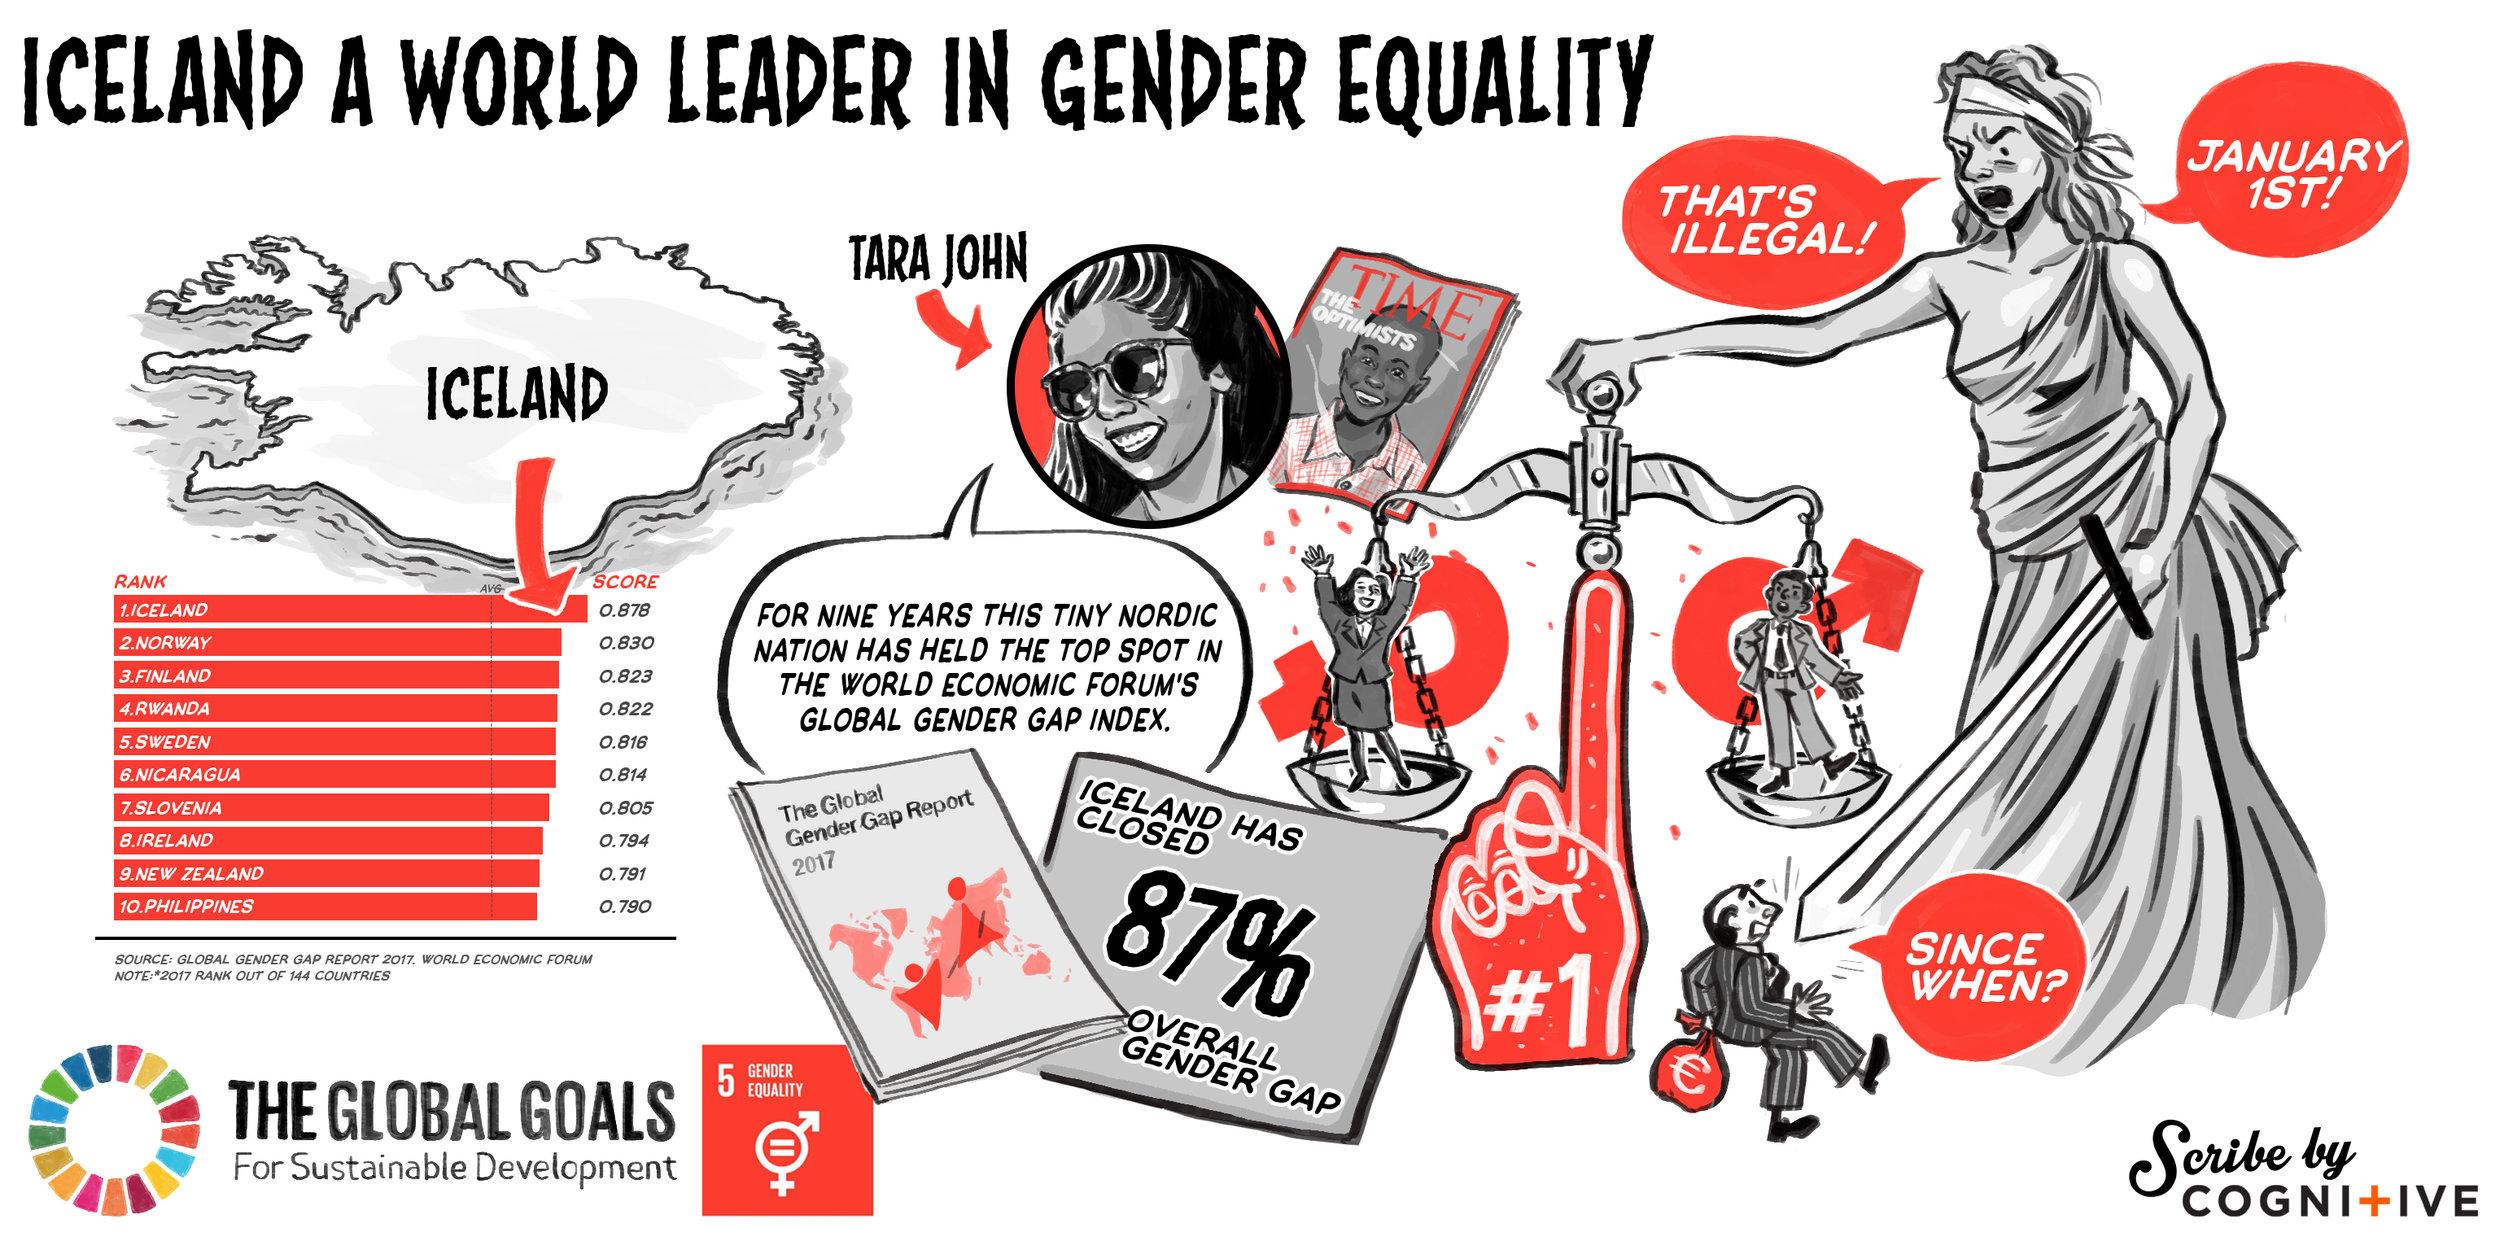 Iceland is a leader in gender equality.